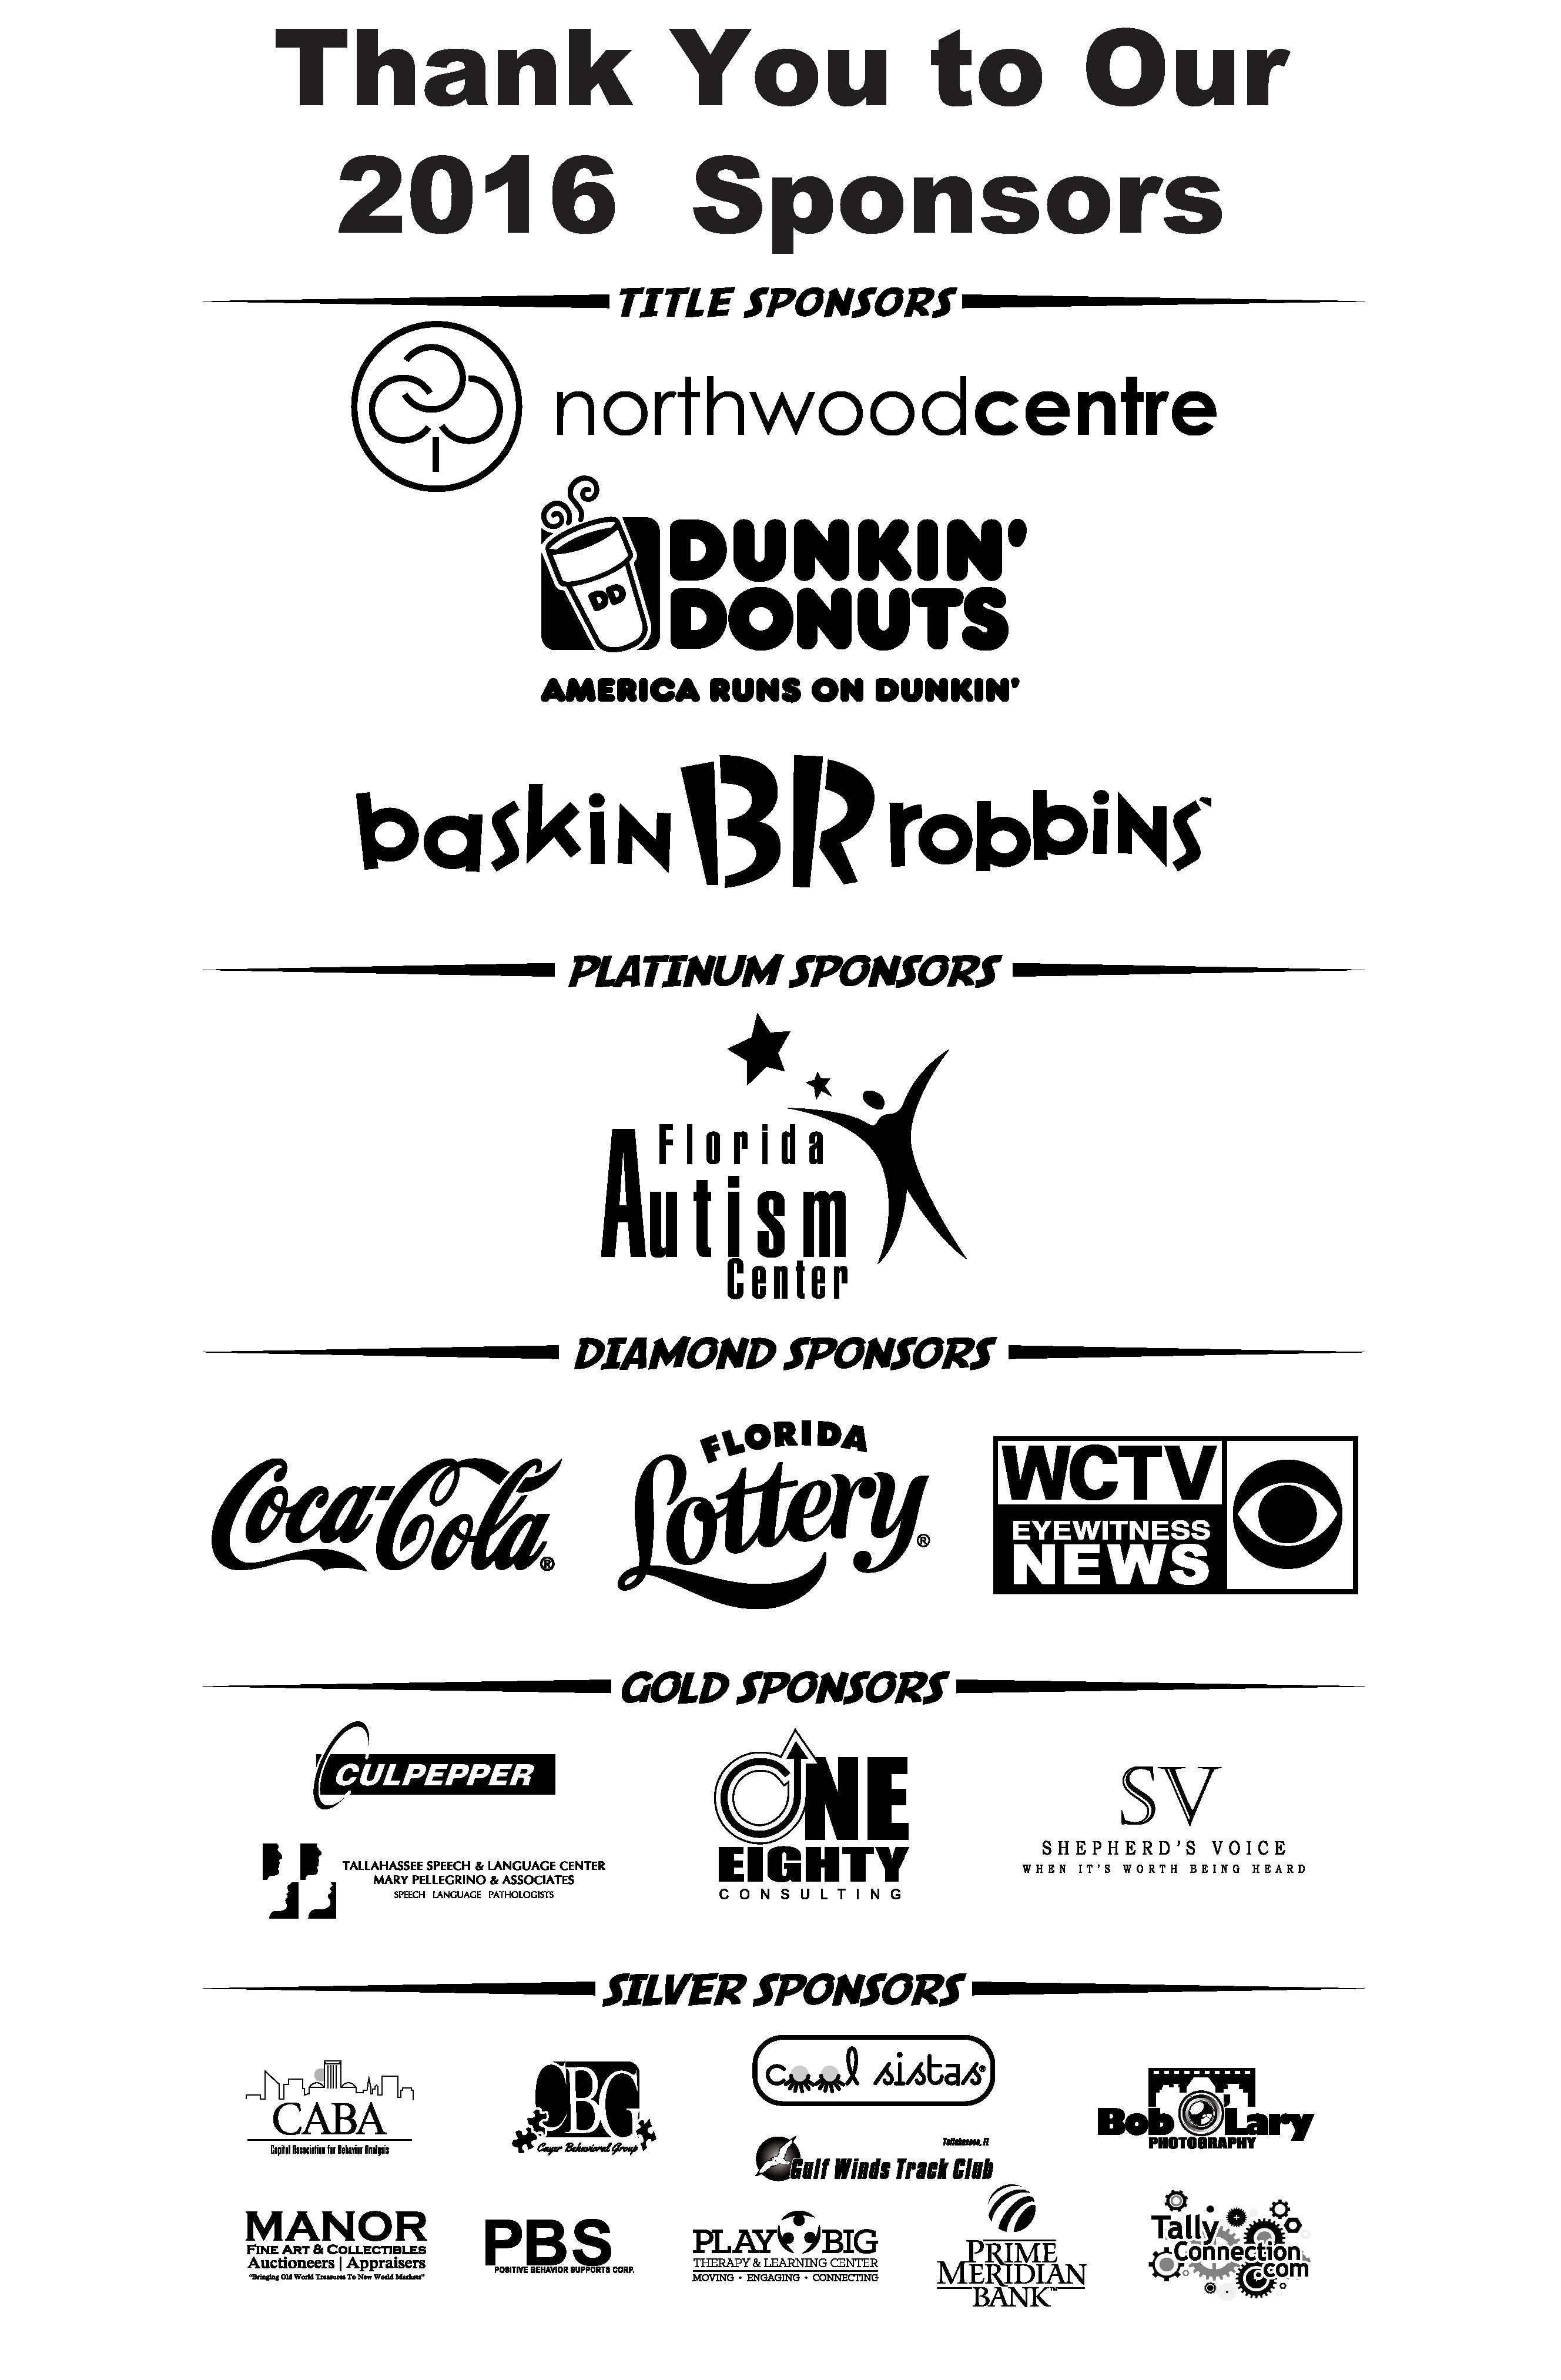 2016 5k sponsors